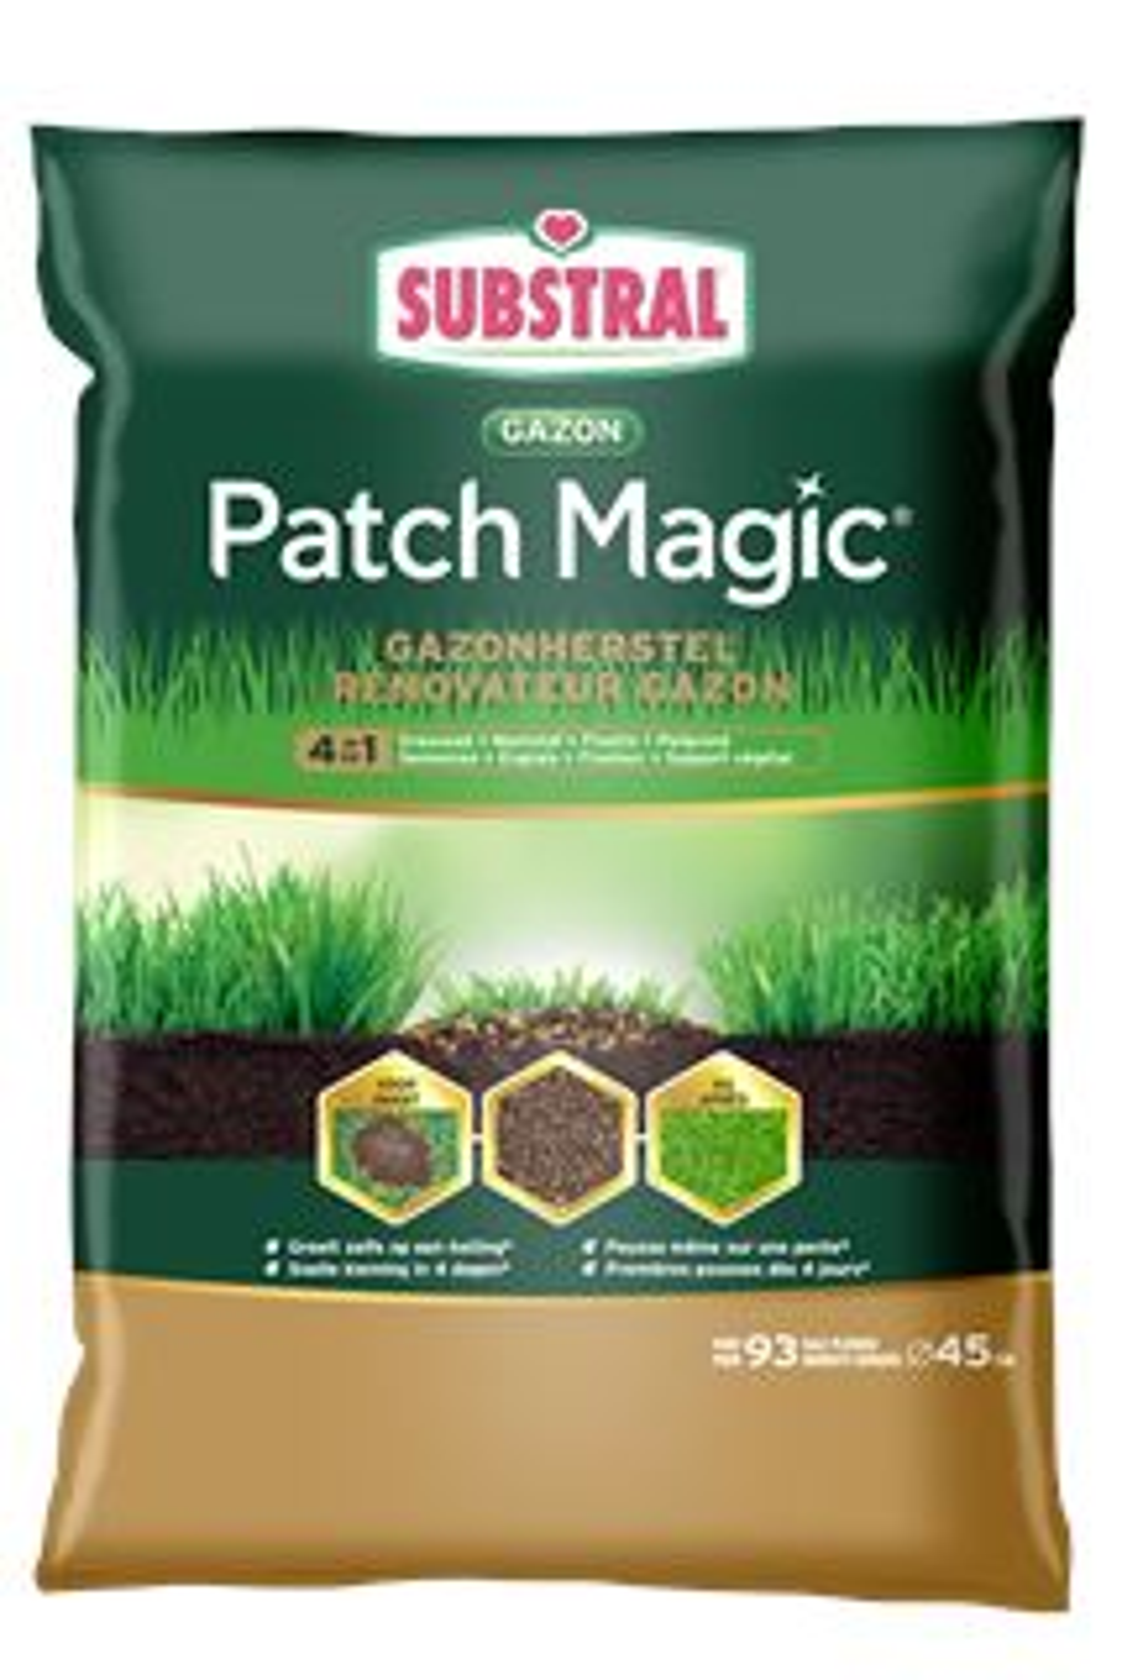 Substral-Patch-Magic-Gazonherstel-4-In-1-7kg